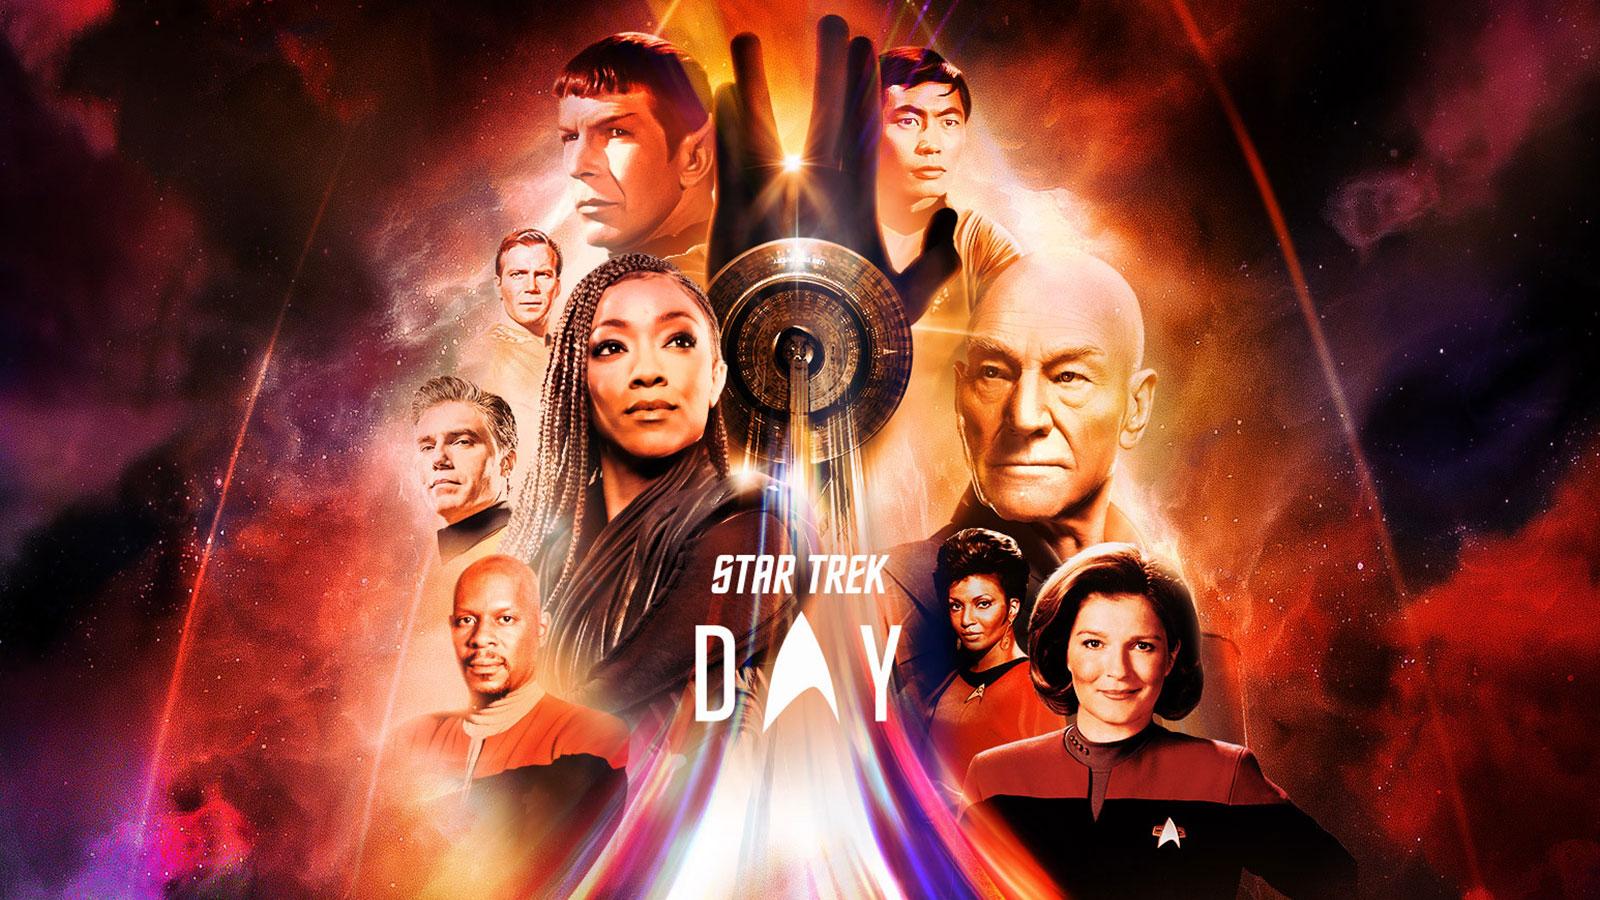 WATCH: Every STAR TREK DAY Panel